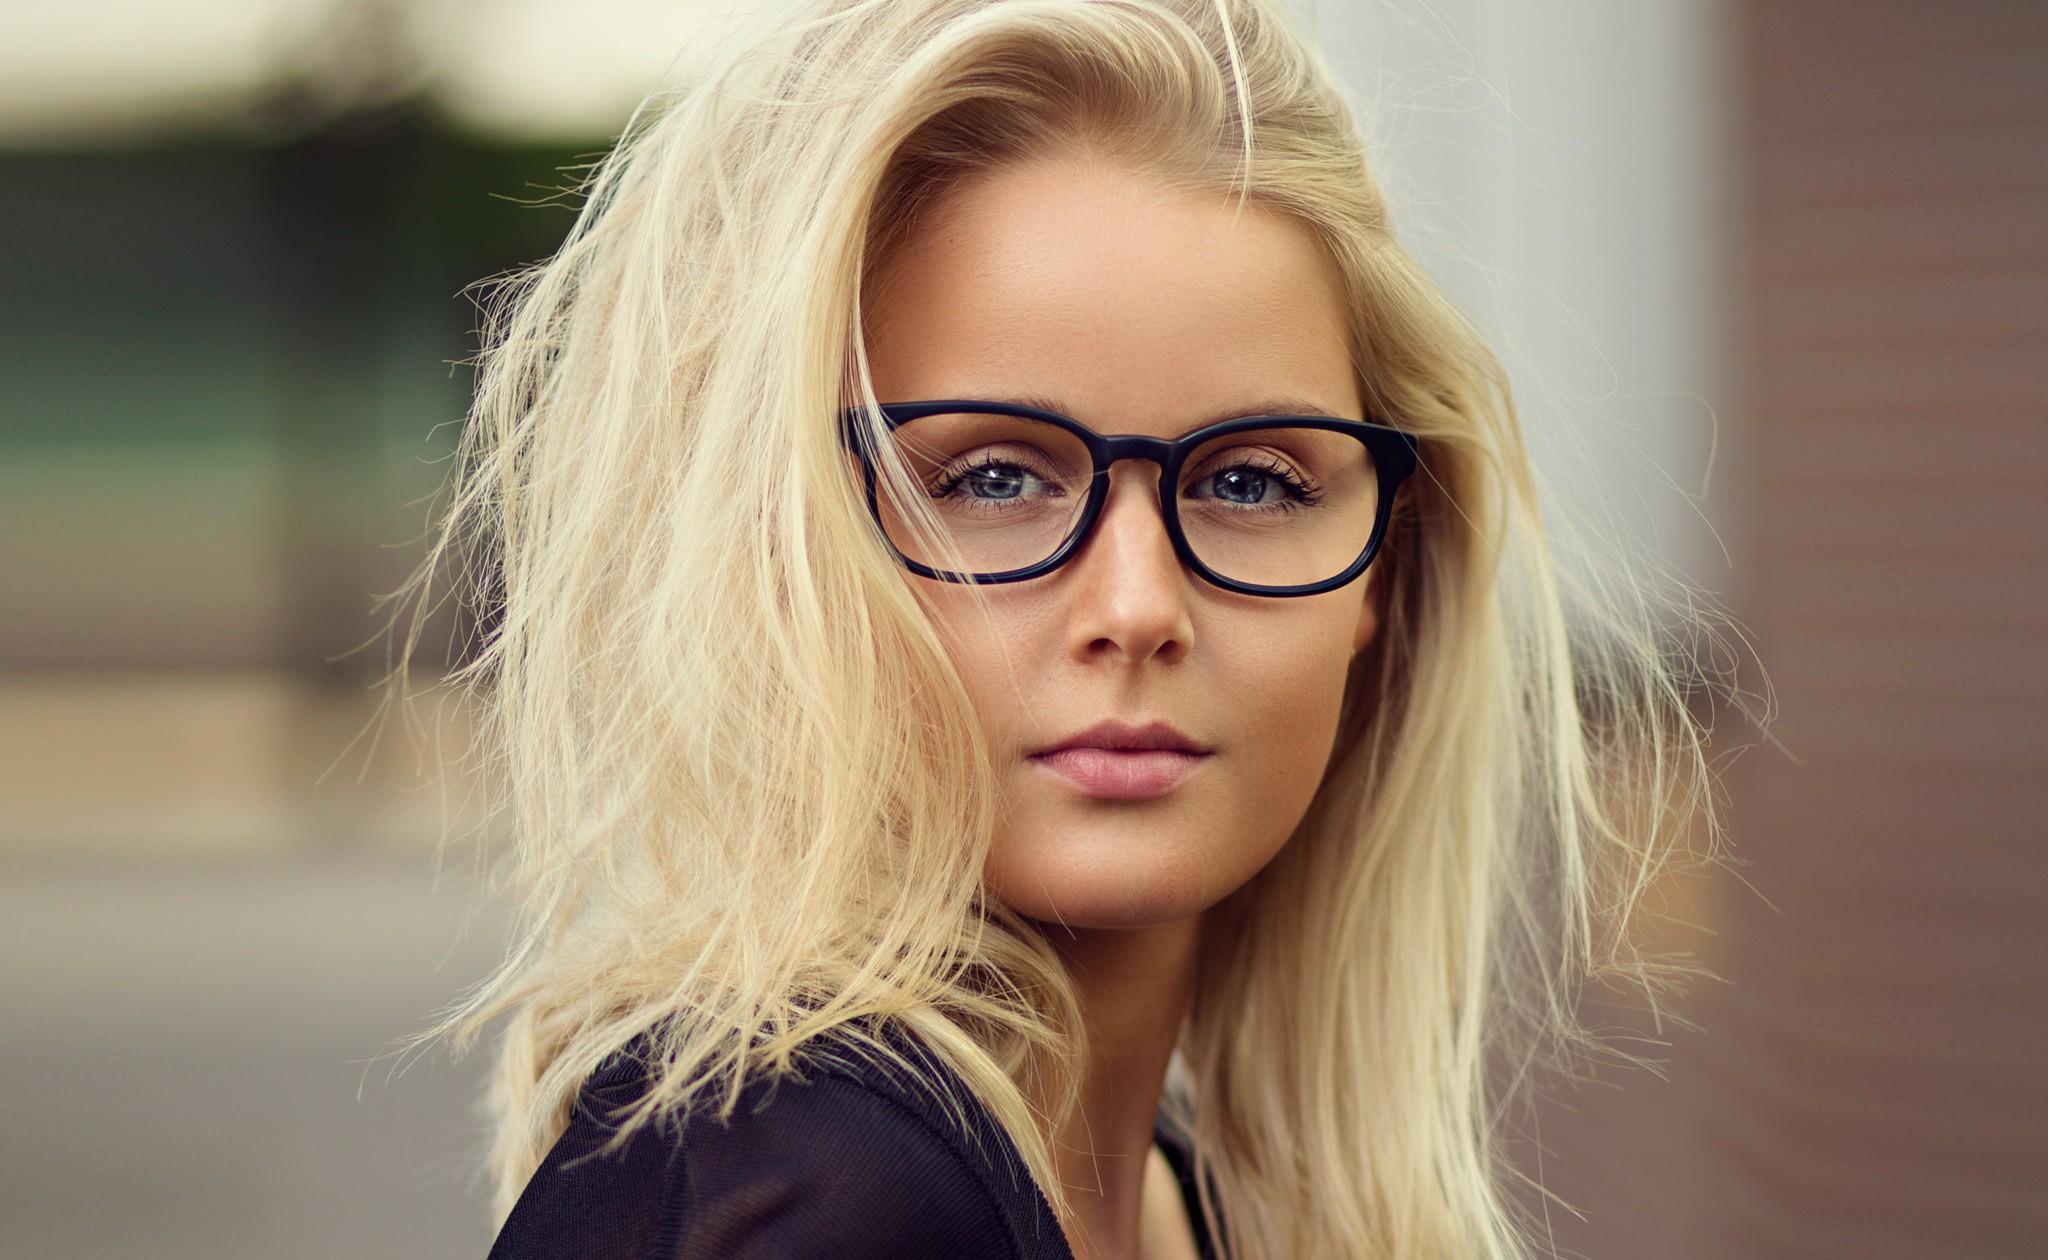 Wallpaper : Face, Model, Blonde, Long Hair, Women With